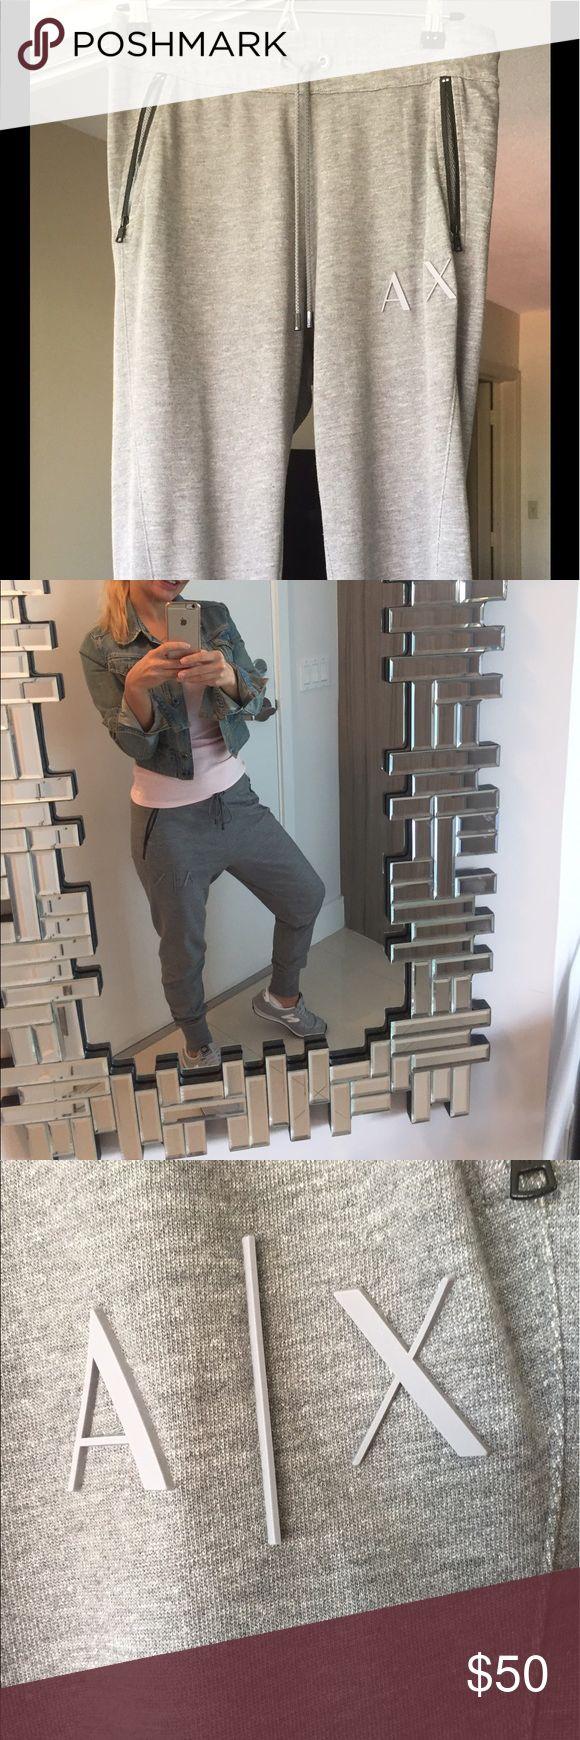 Selling this Armani Exchange Women's Jogging Pants Small on Poshmark! My username is: ekaterina33. #shopmycloset #poshmark #fashion #shopping #style #forsale #A/X Armani Exchange #Pants